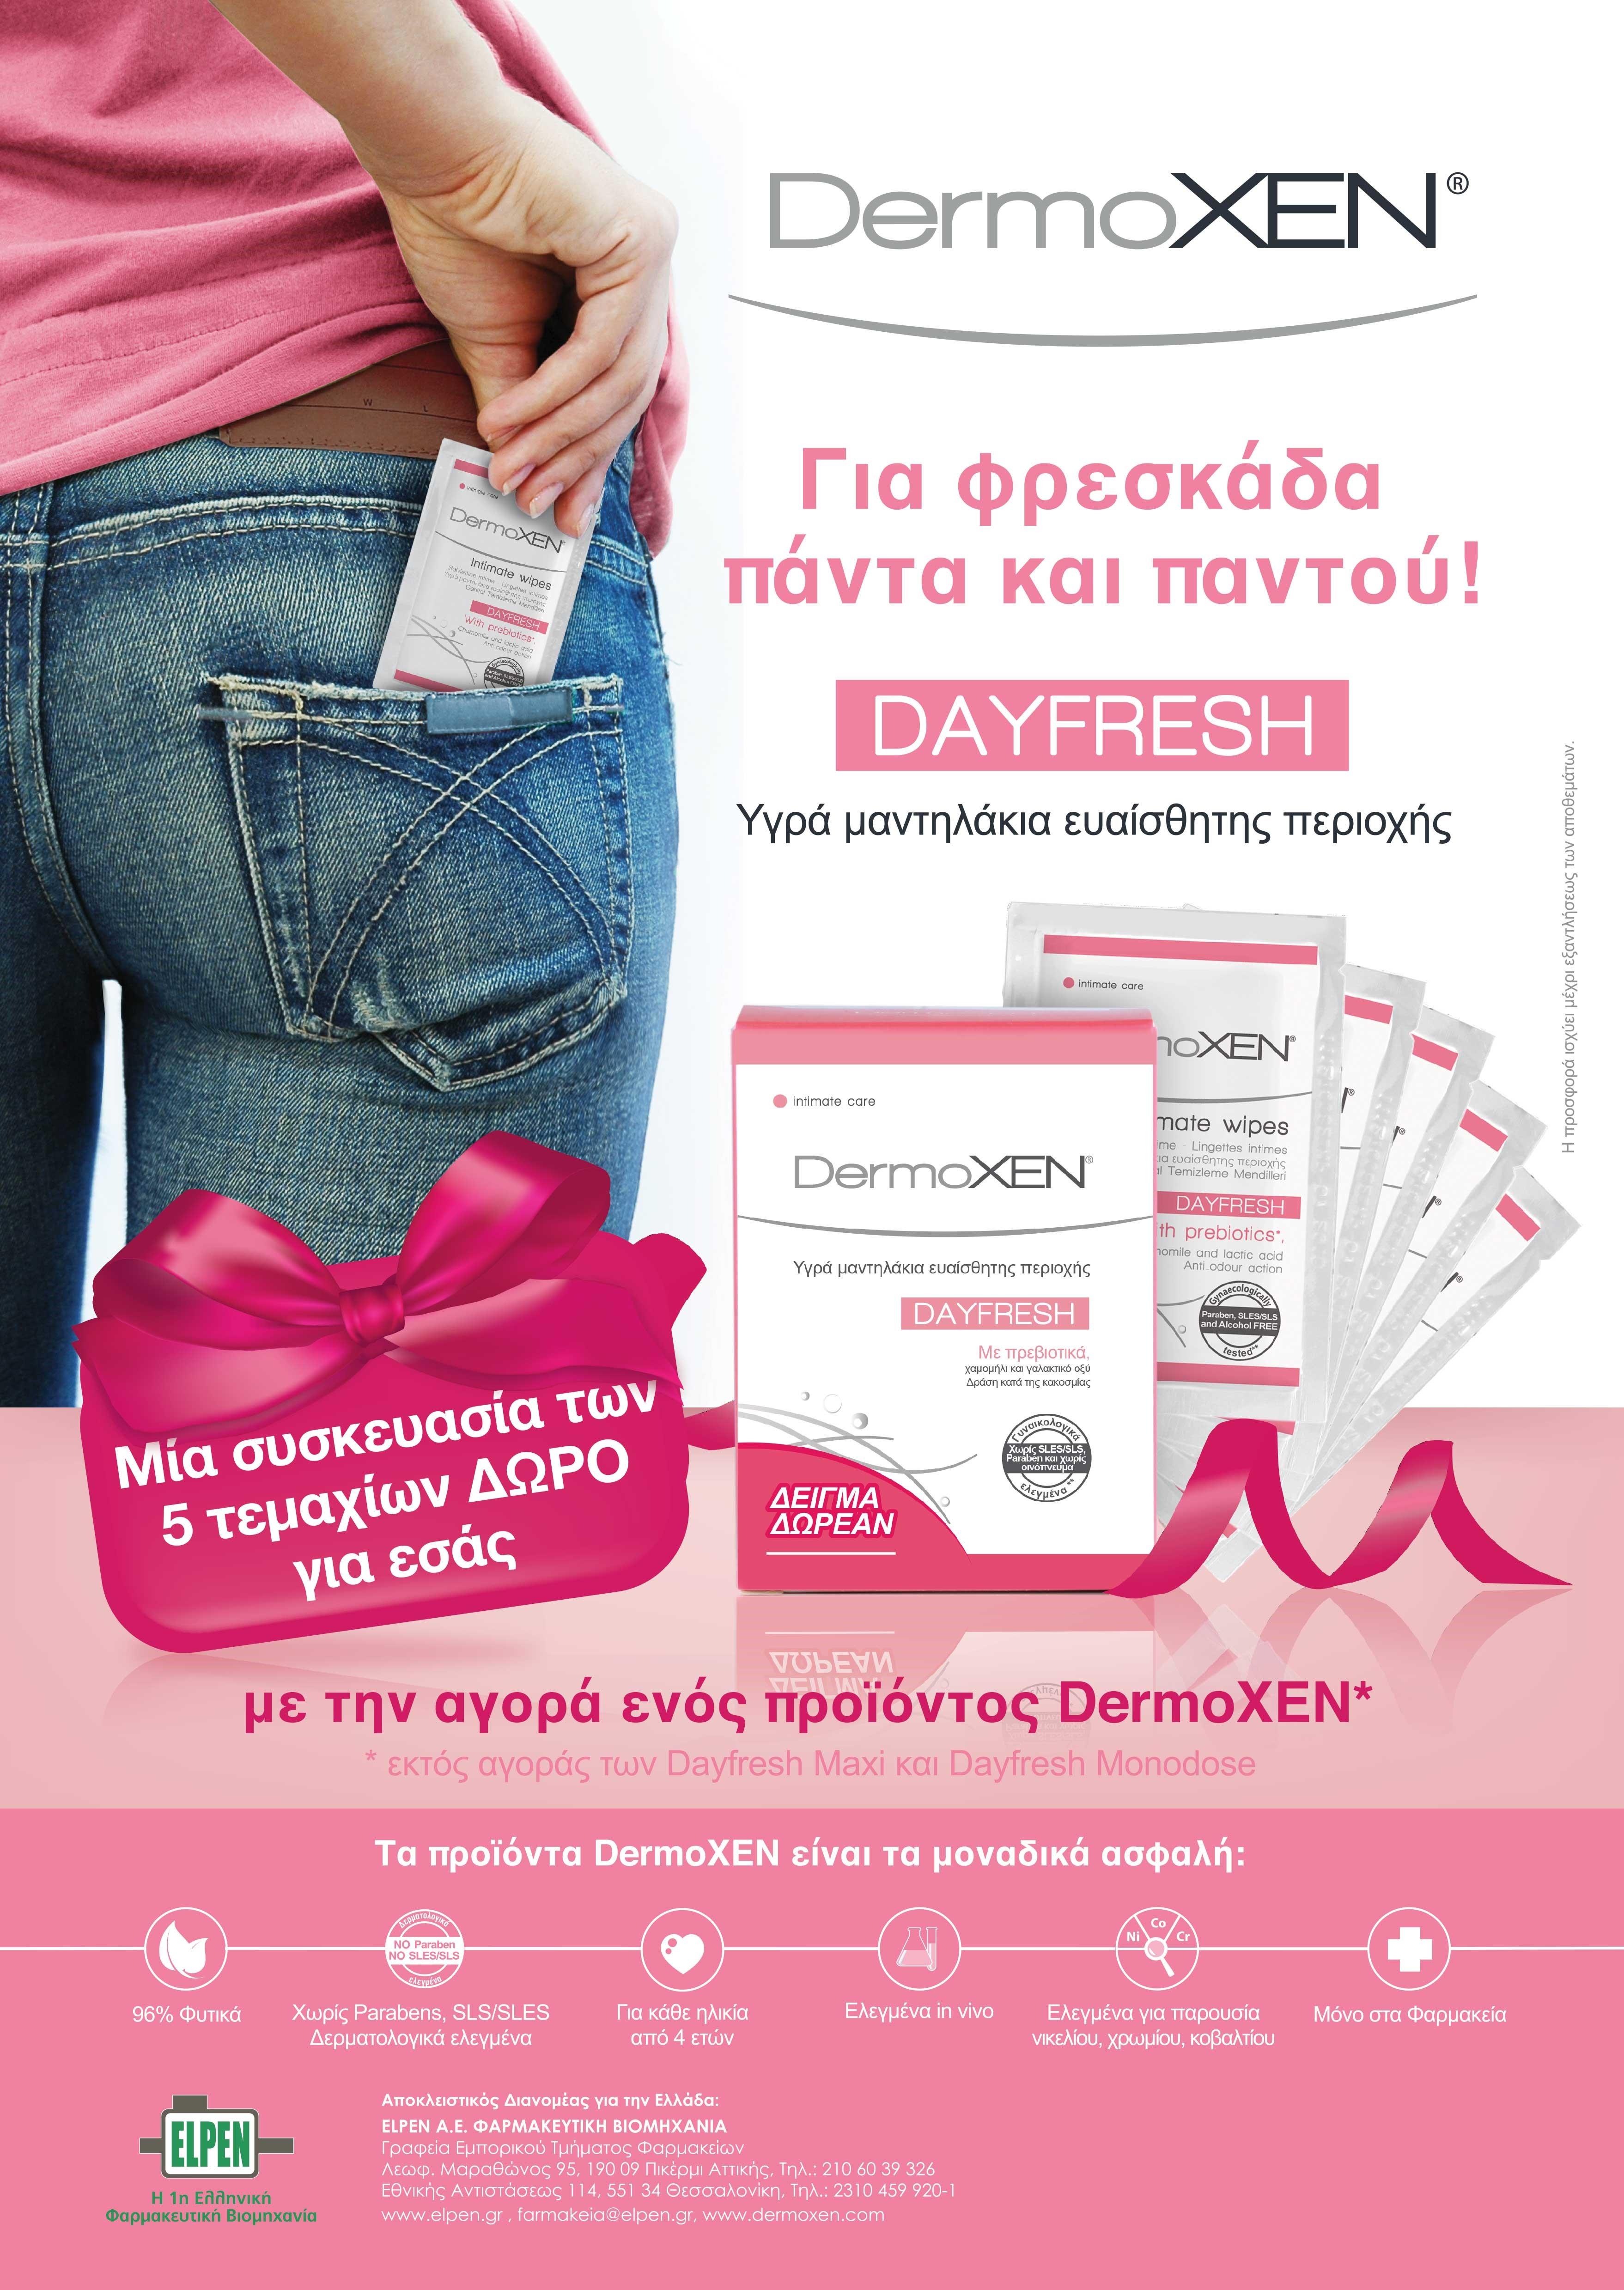 Dermoxen Προϊόντα για την ευαίσθητη περιοχή